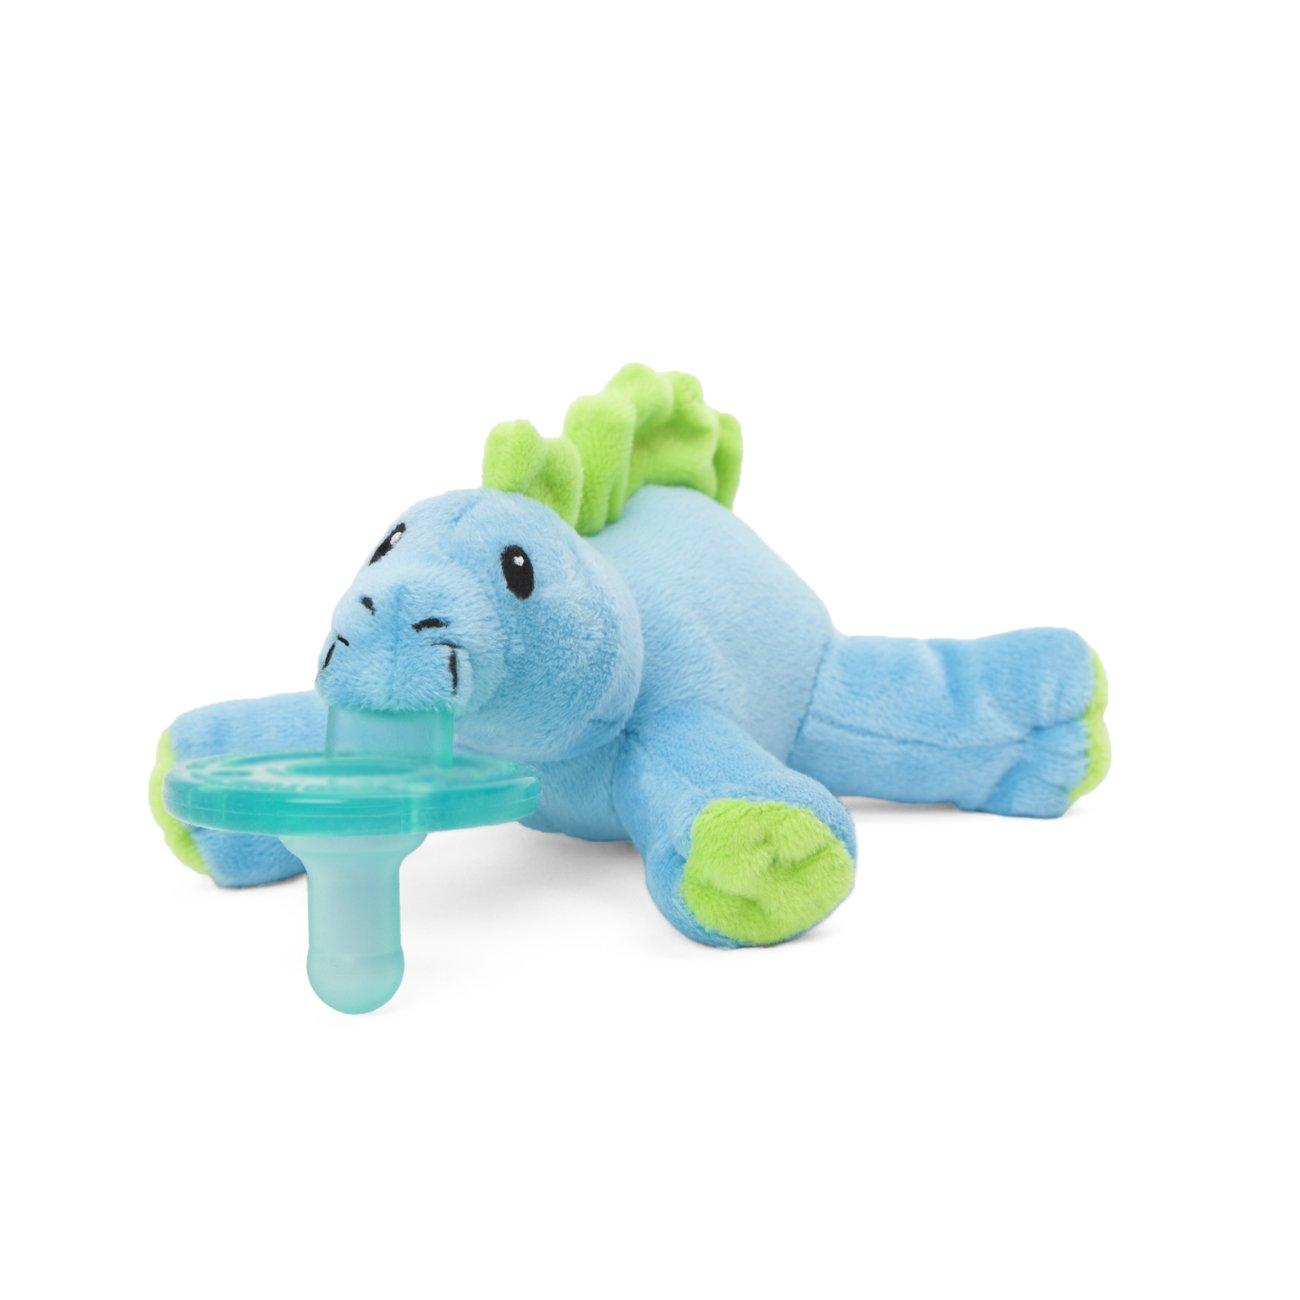 Wubbanub Brights Infant Pacifier - Baby Dino